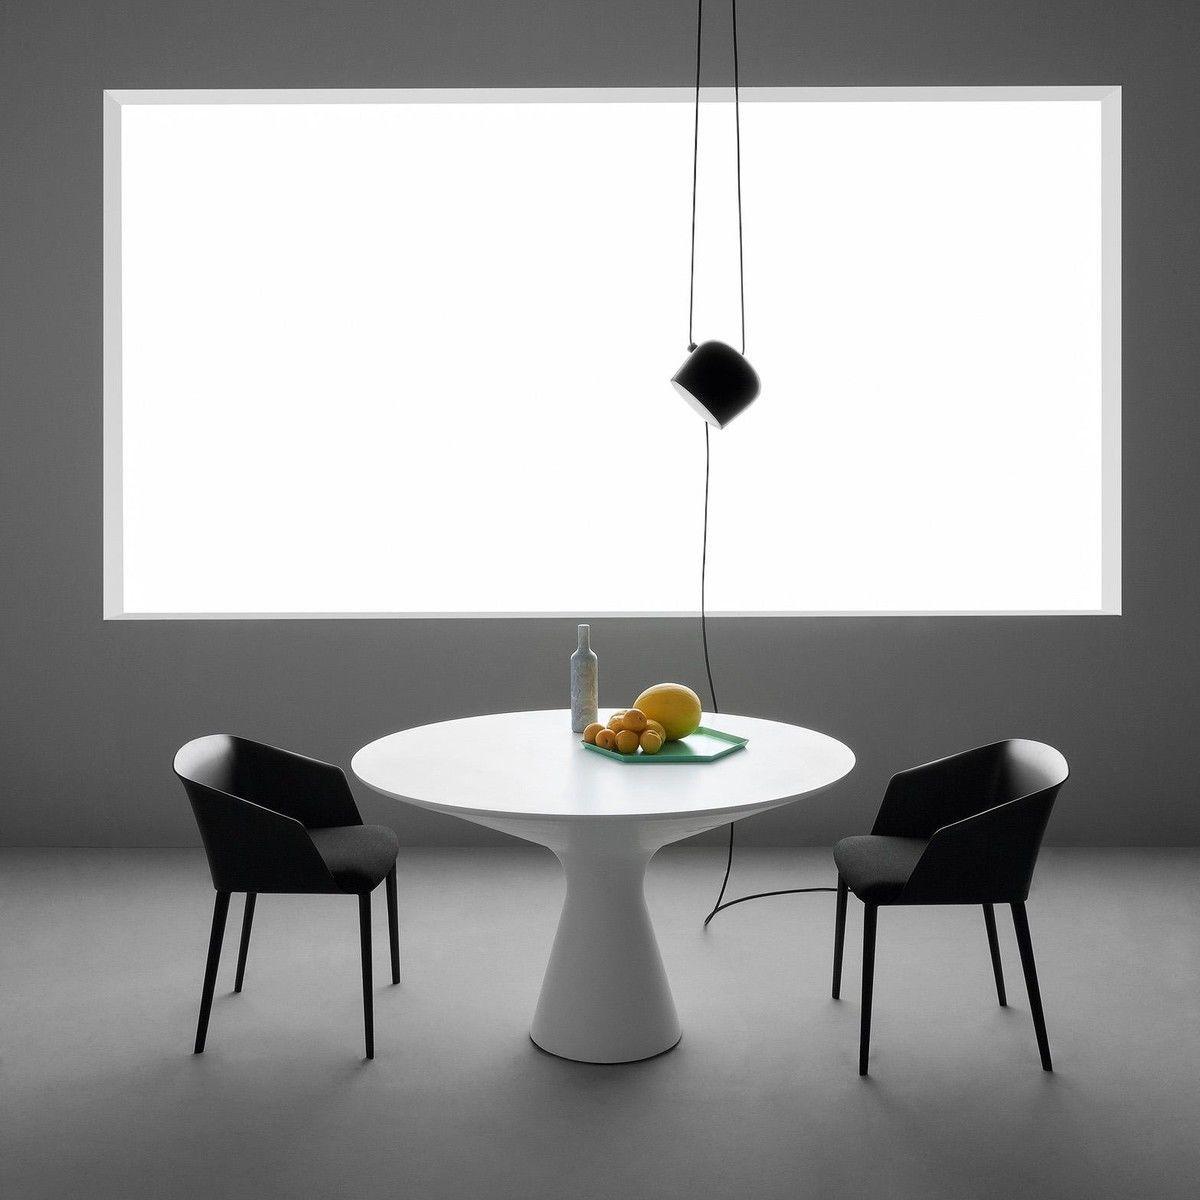 Aim LED Suspension Lamp With Plug Flos AmbienteDirectcom